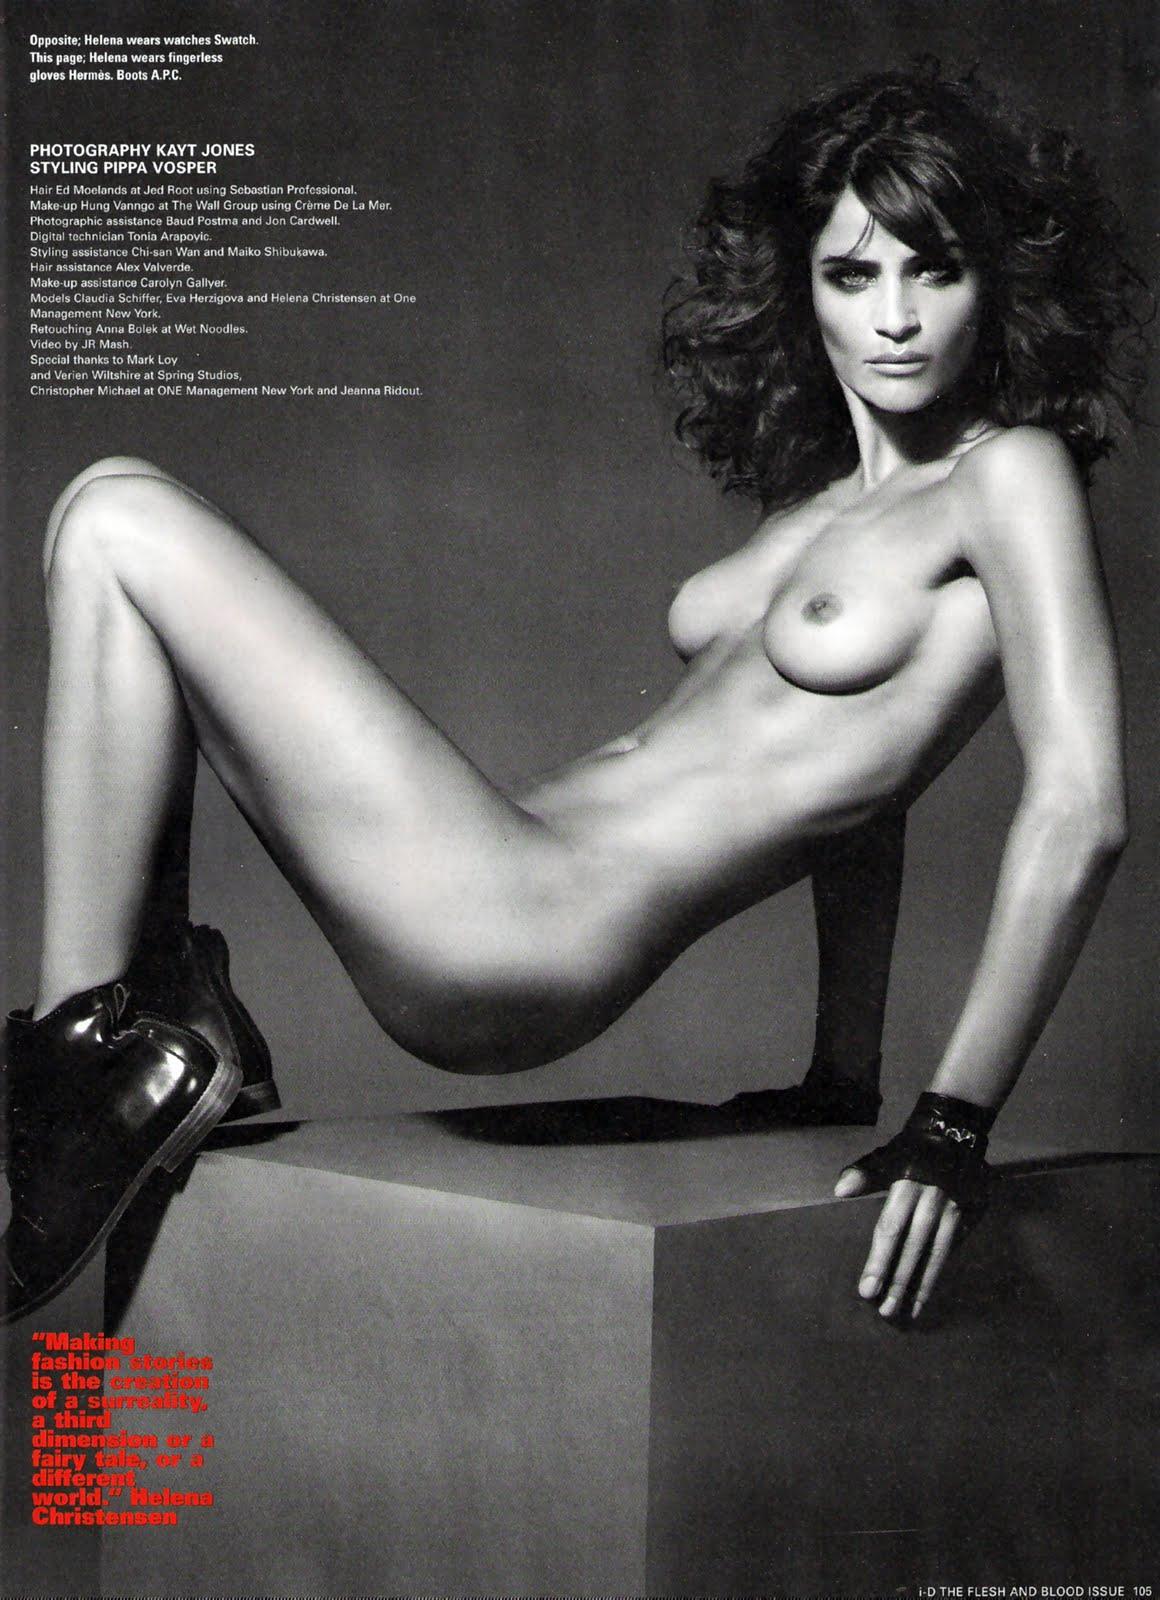 Хелена кристенсен эротические фото 6 фотография